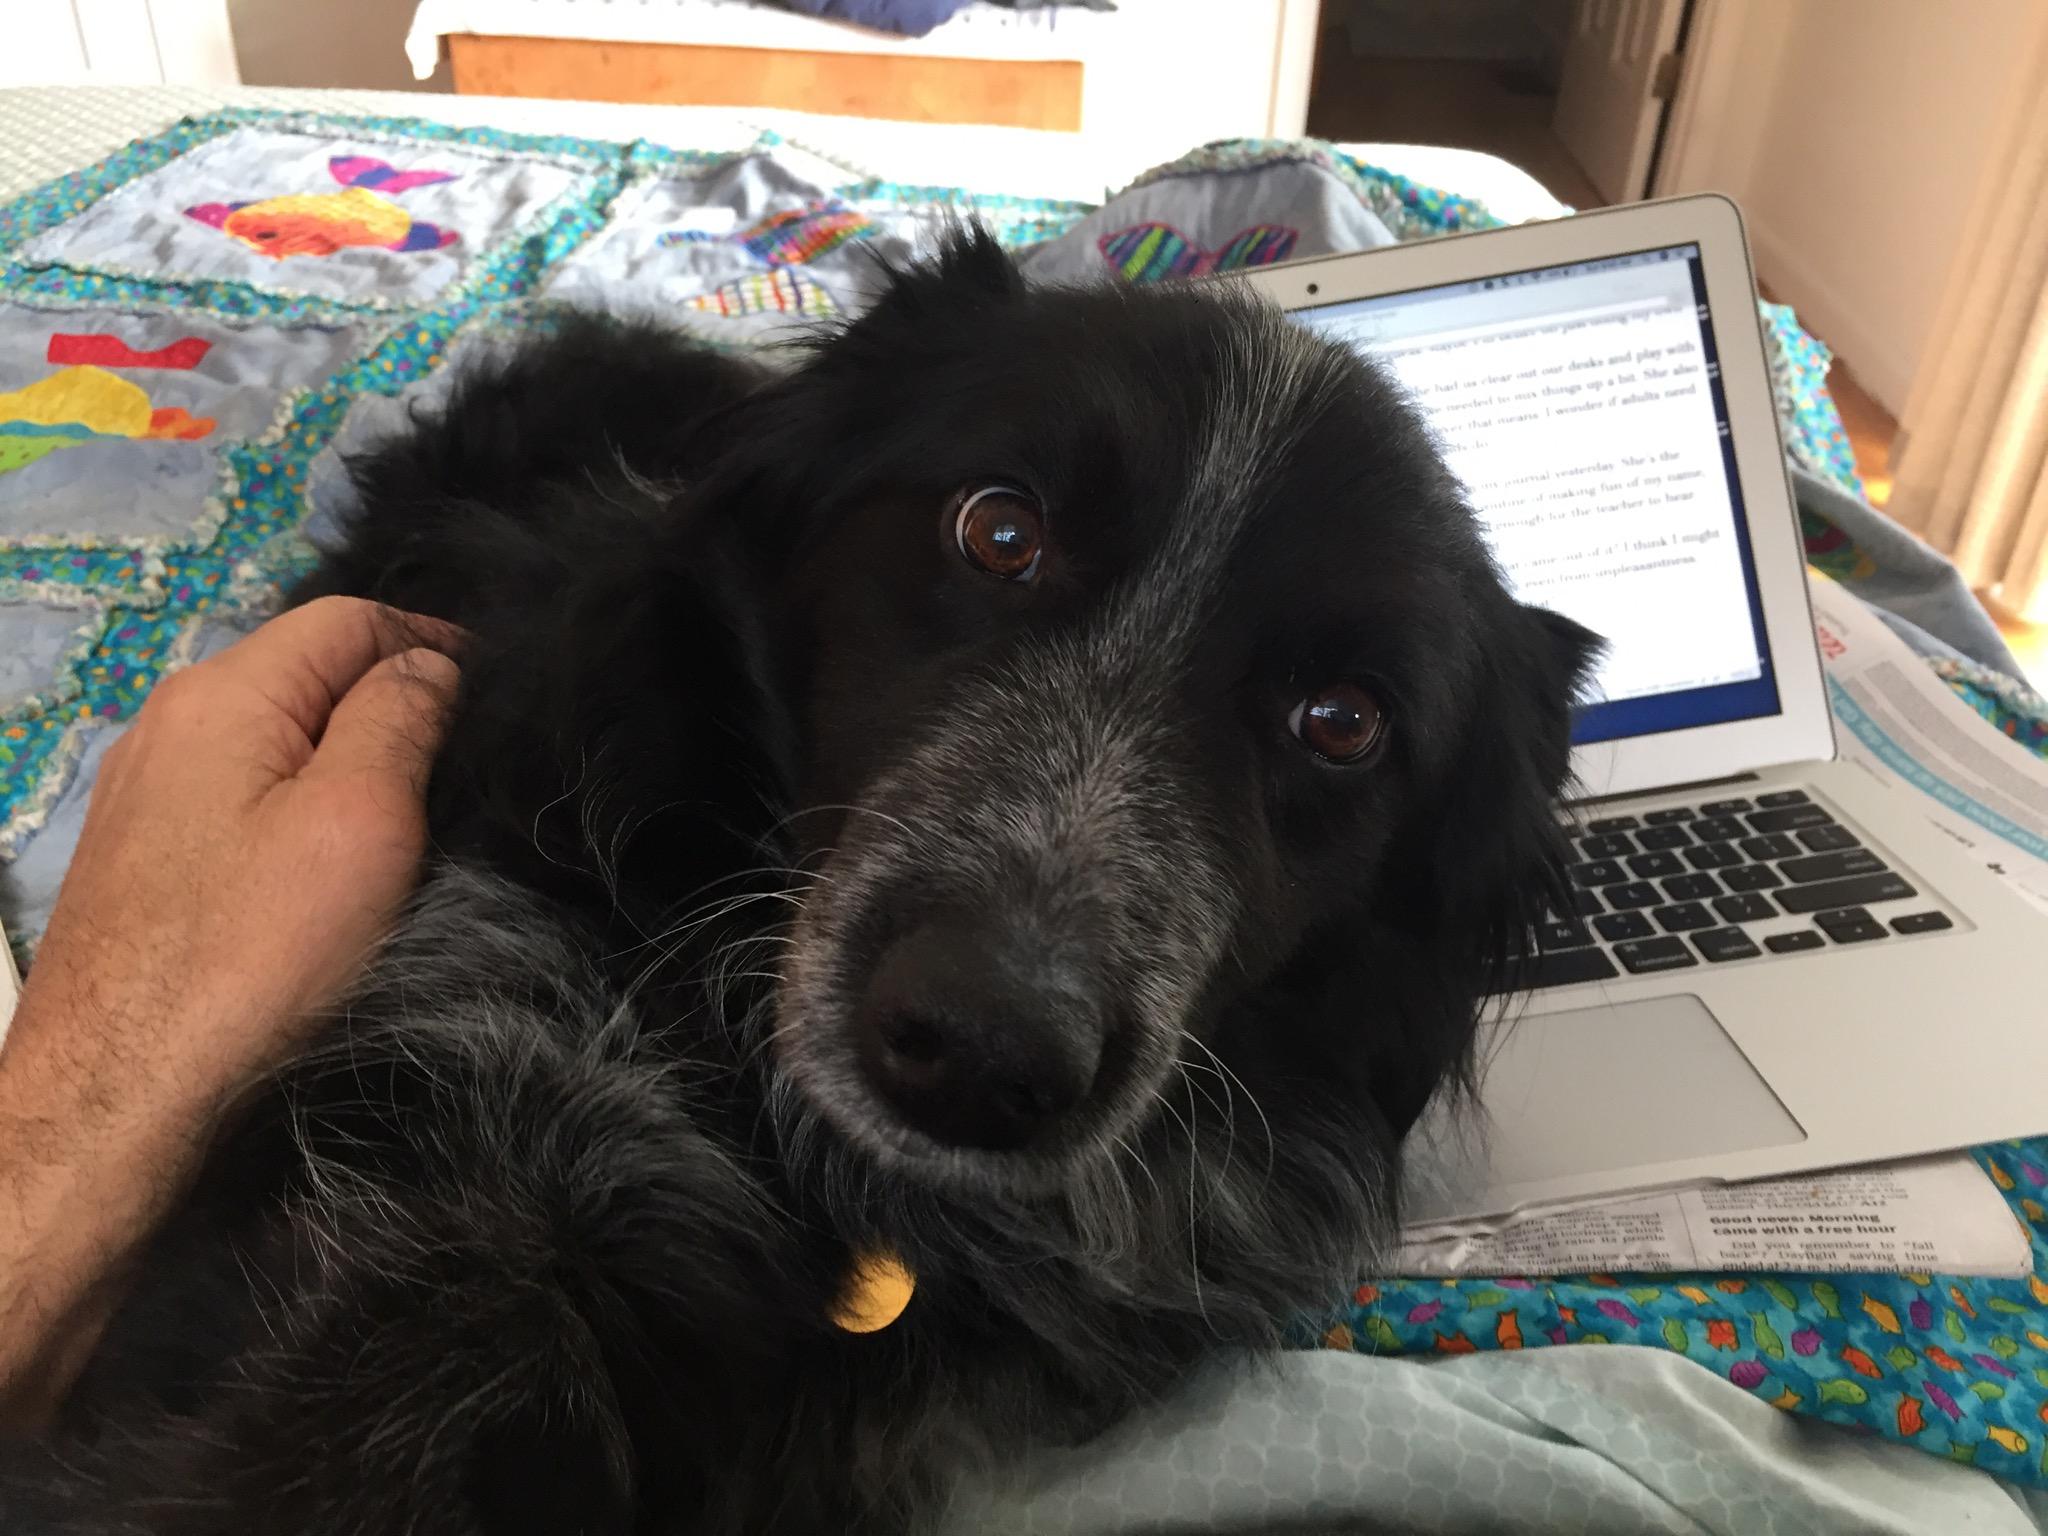 black dog leaning against laptop keyboard